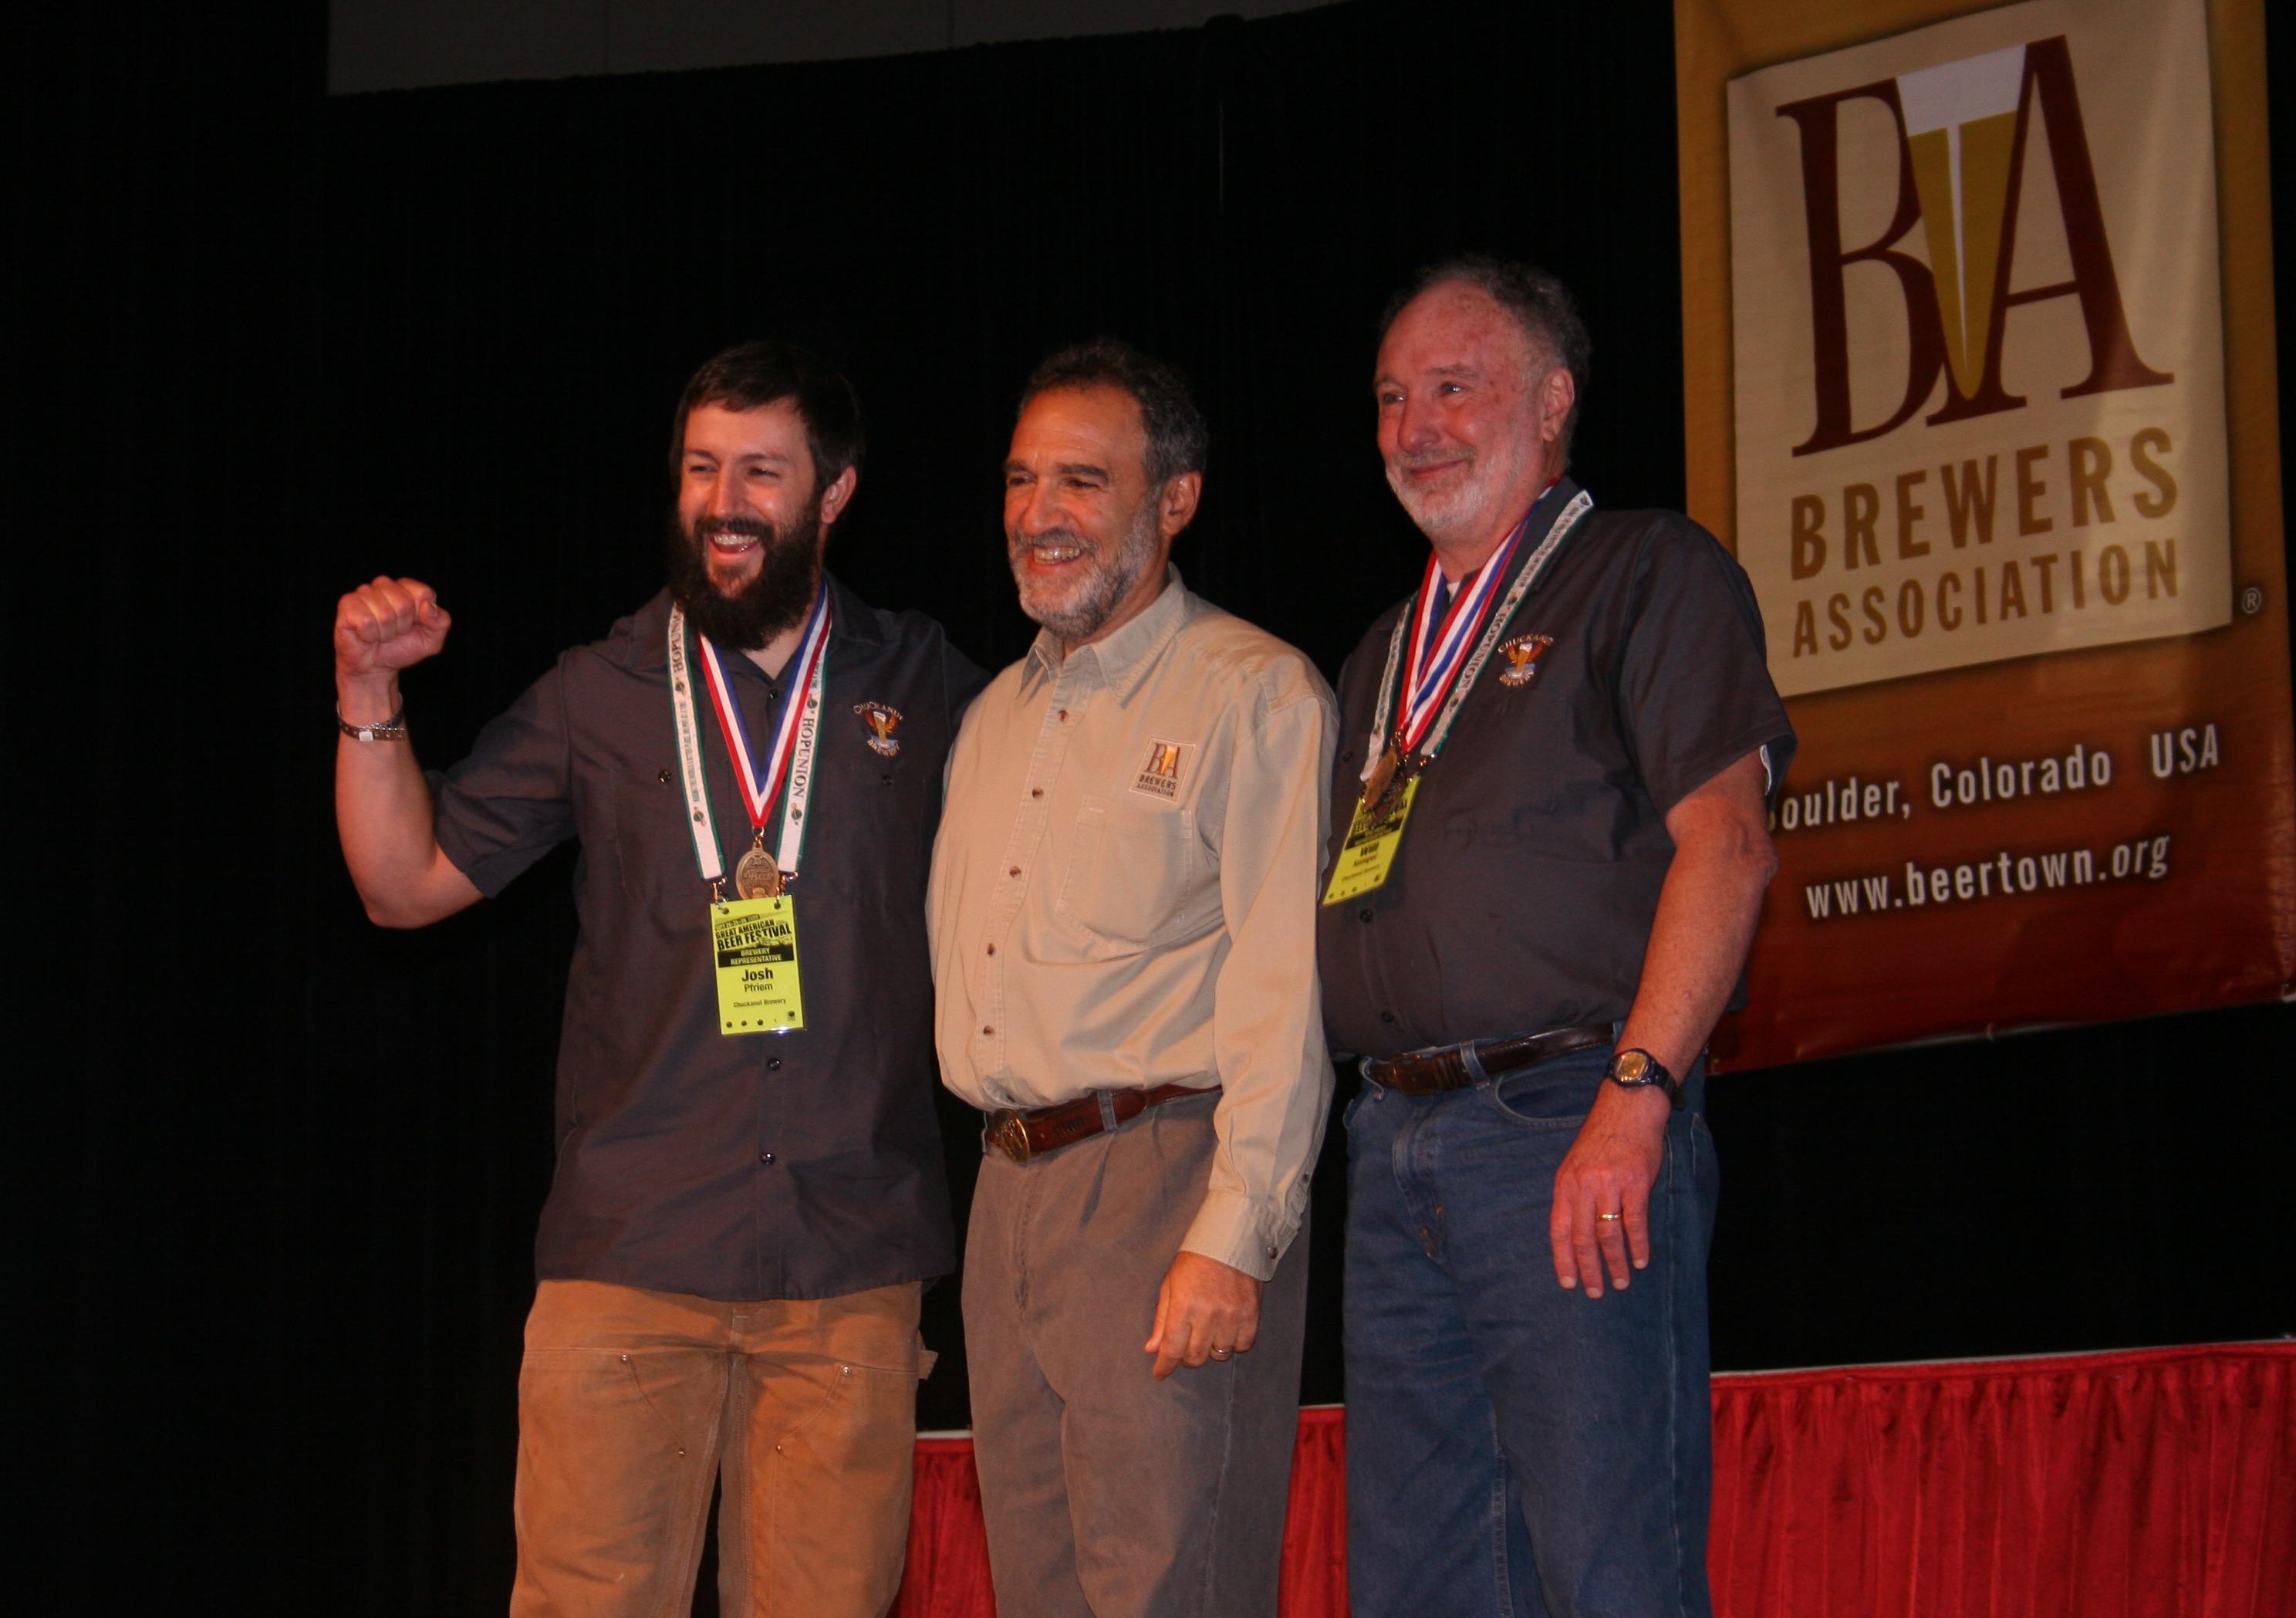 (l to r) Chuckanut lead brewer Josh Pfiem, award guy Charlie Papazian, and Chuckanut brewmaster Will Kemper